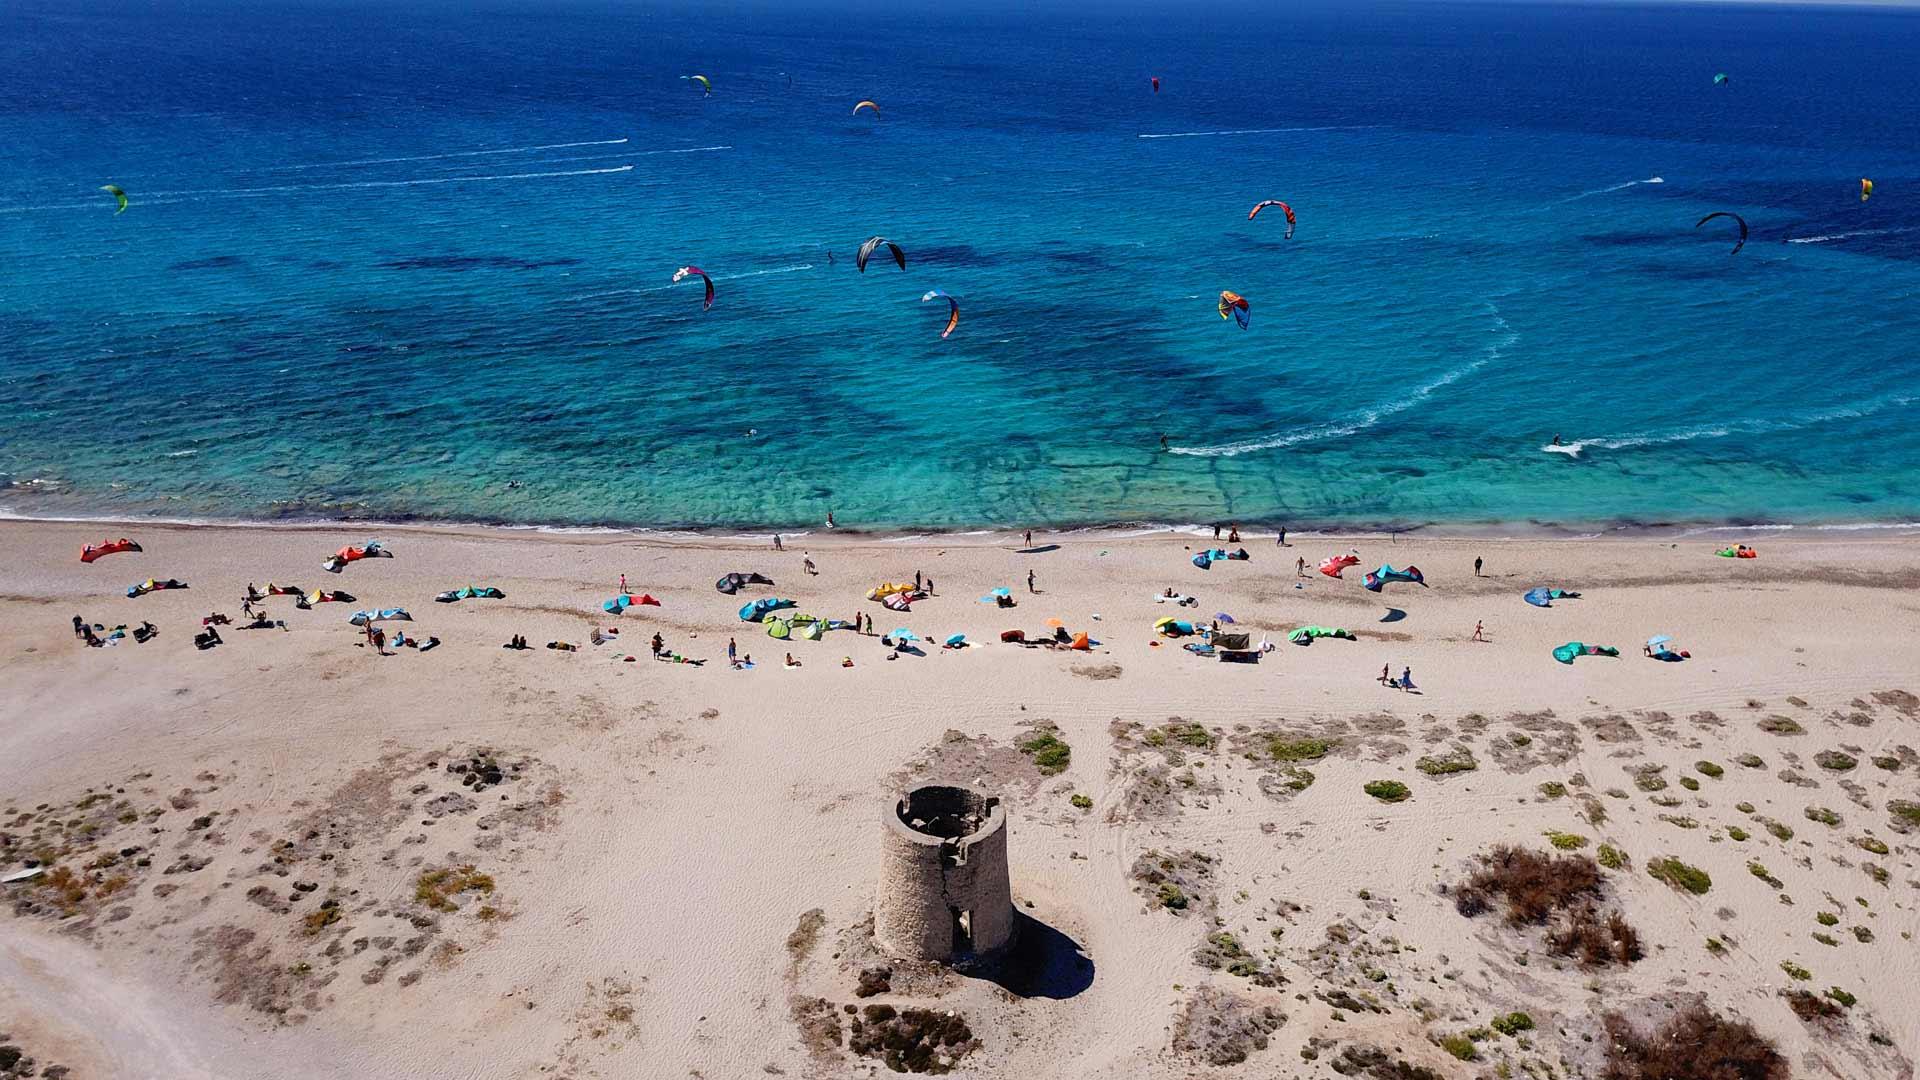 Milos Beach Lefkada, Spiaggia per Kitesurf e Windsurf